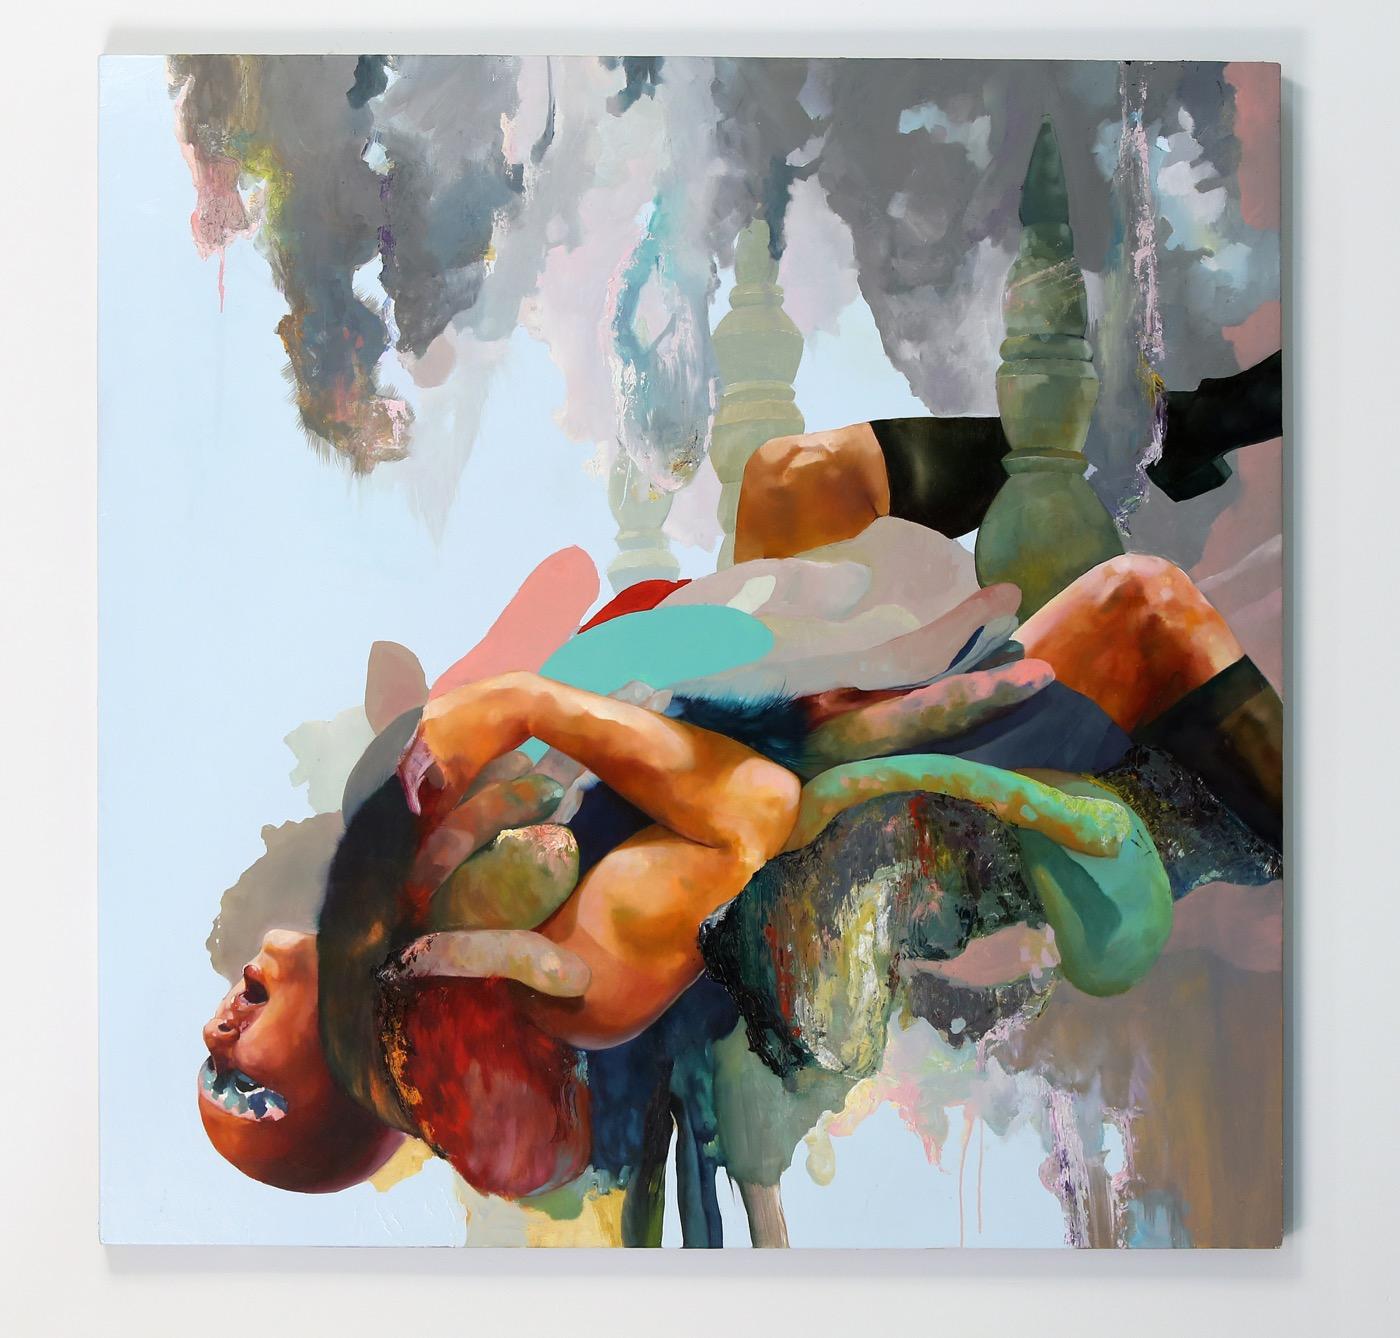 David Antonio Cruz, bybeingcarefulofthecompanyyoukeep, 2016 Oil on wood panel, 48 x 48 in (Courtesythe Artist andGateway Projects)